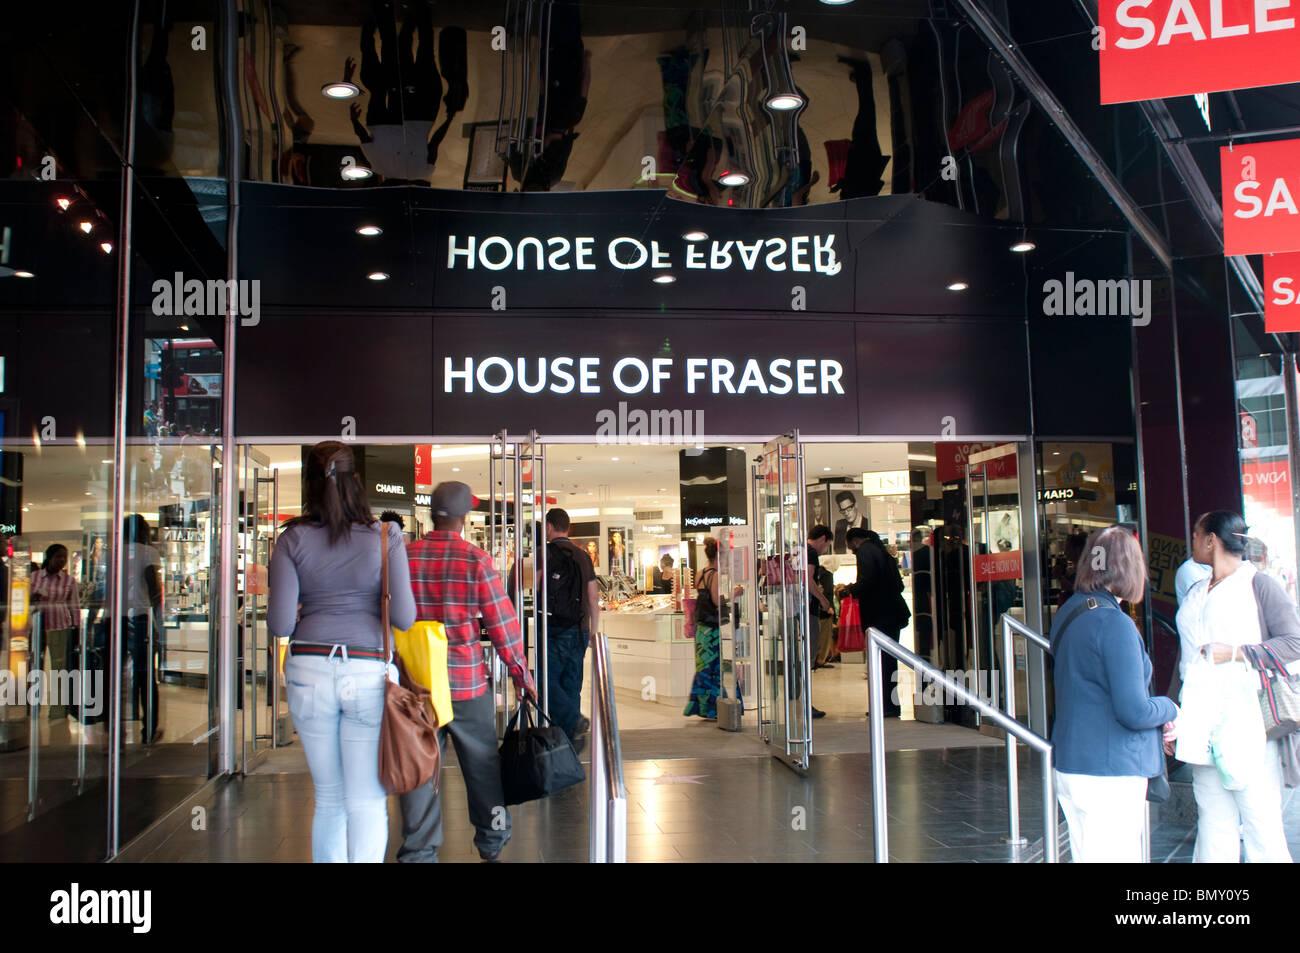 House of Fraser shop on Oxford Street, London, UK - Stock Image